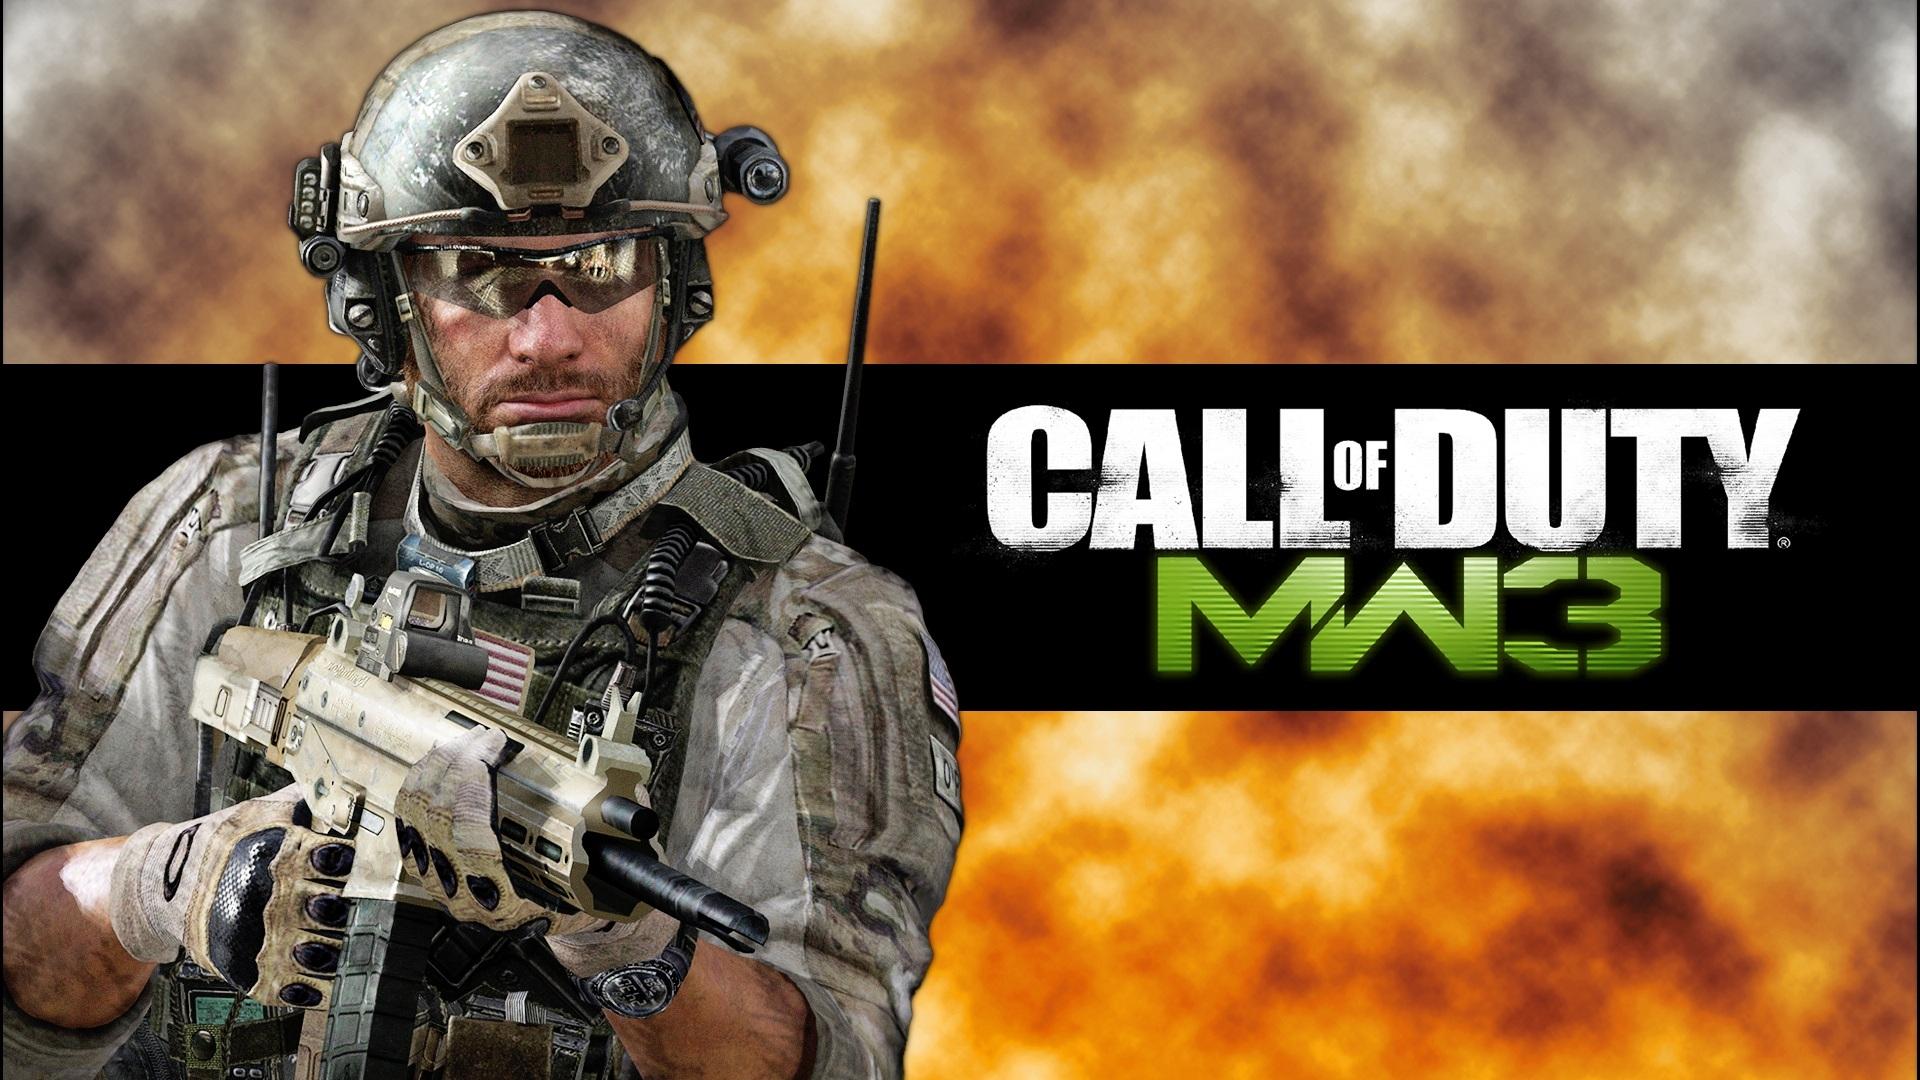 Call of Duty Modern Warfare 3 wallpaper 28